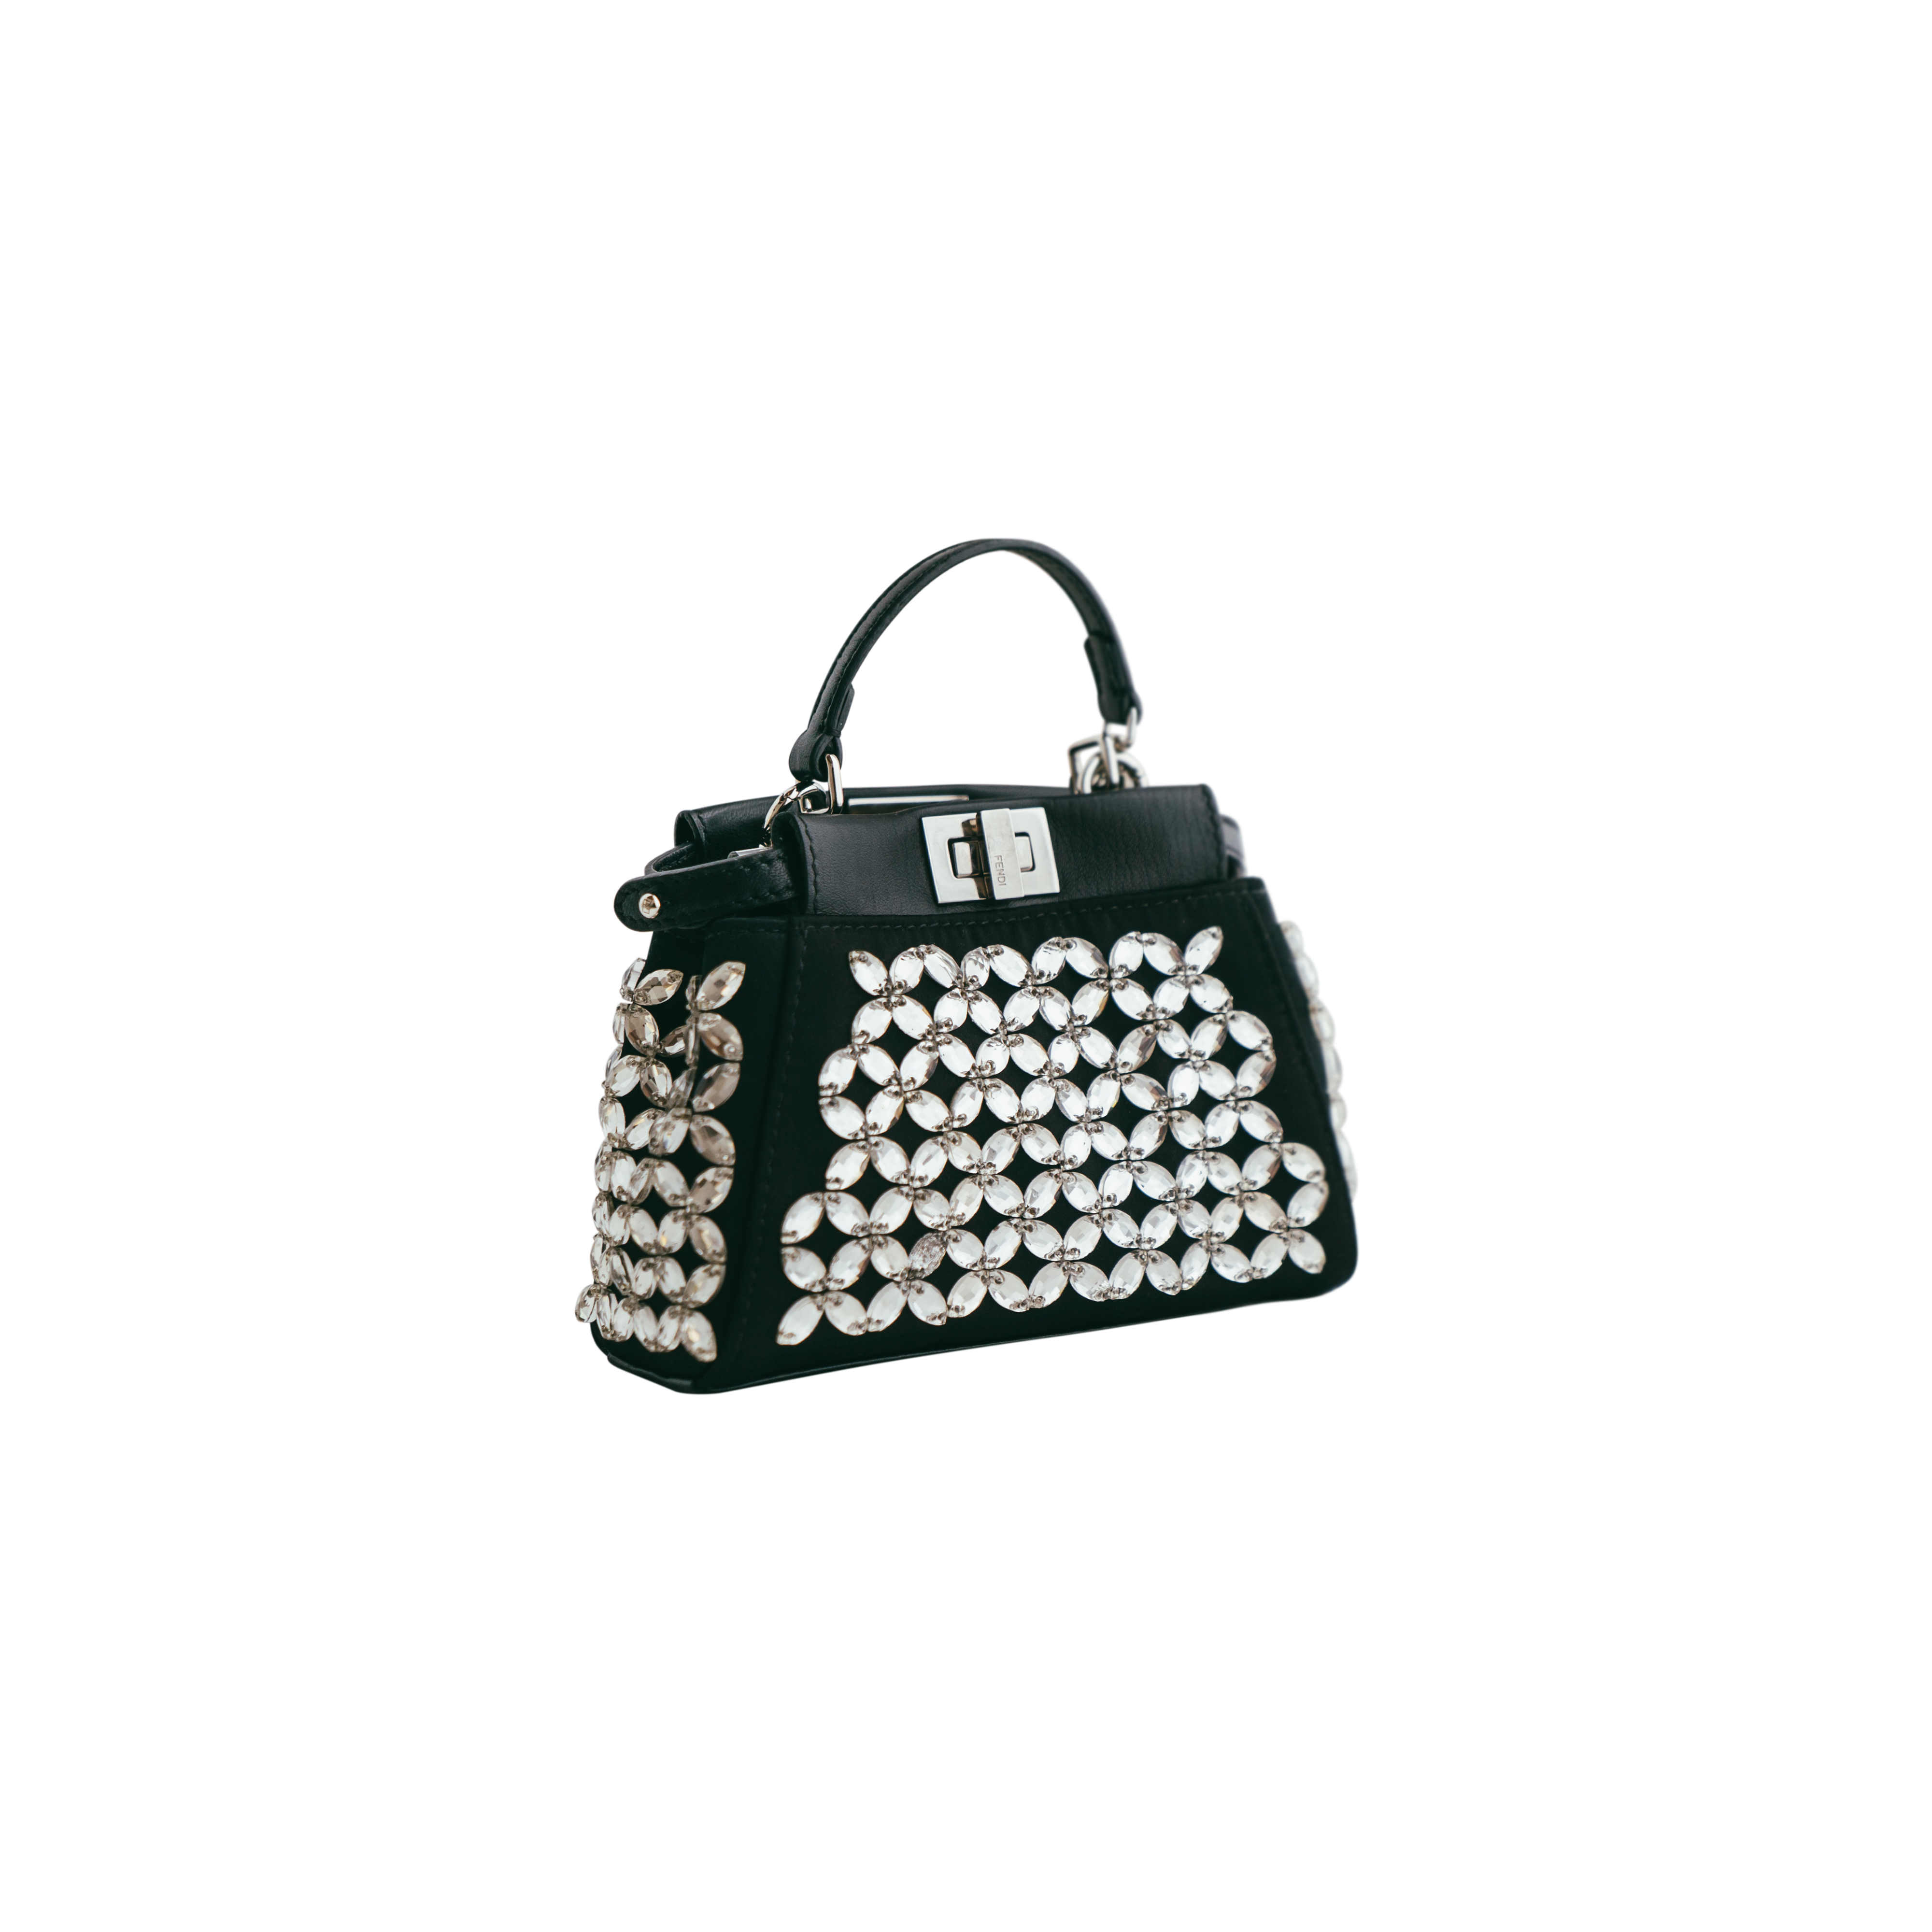 4fa695e4285 Fendi Crystal Embellished Micro Peekaboo Bag